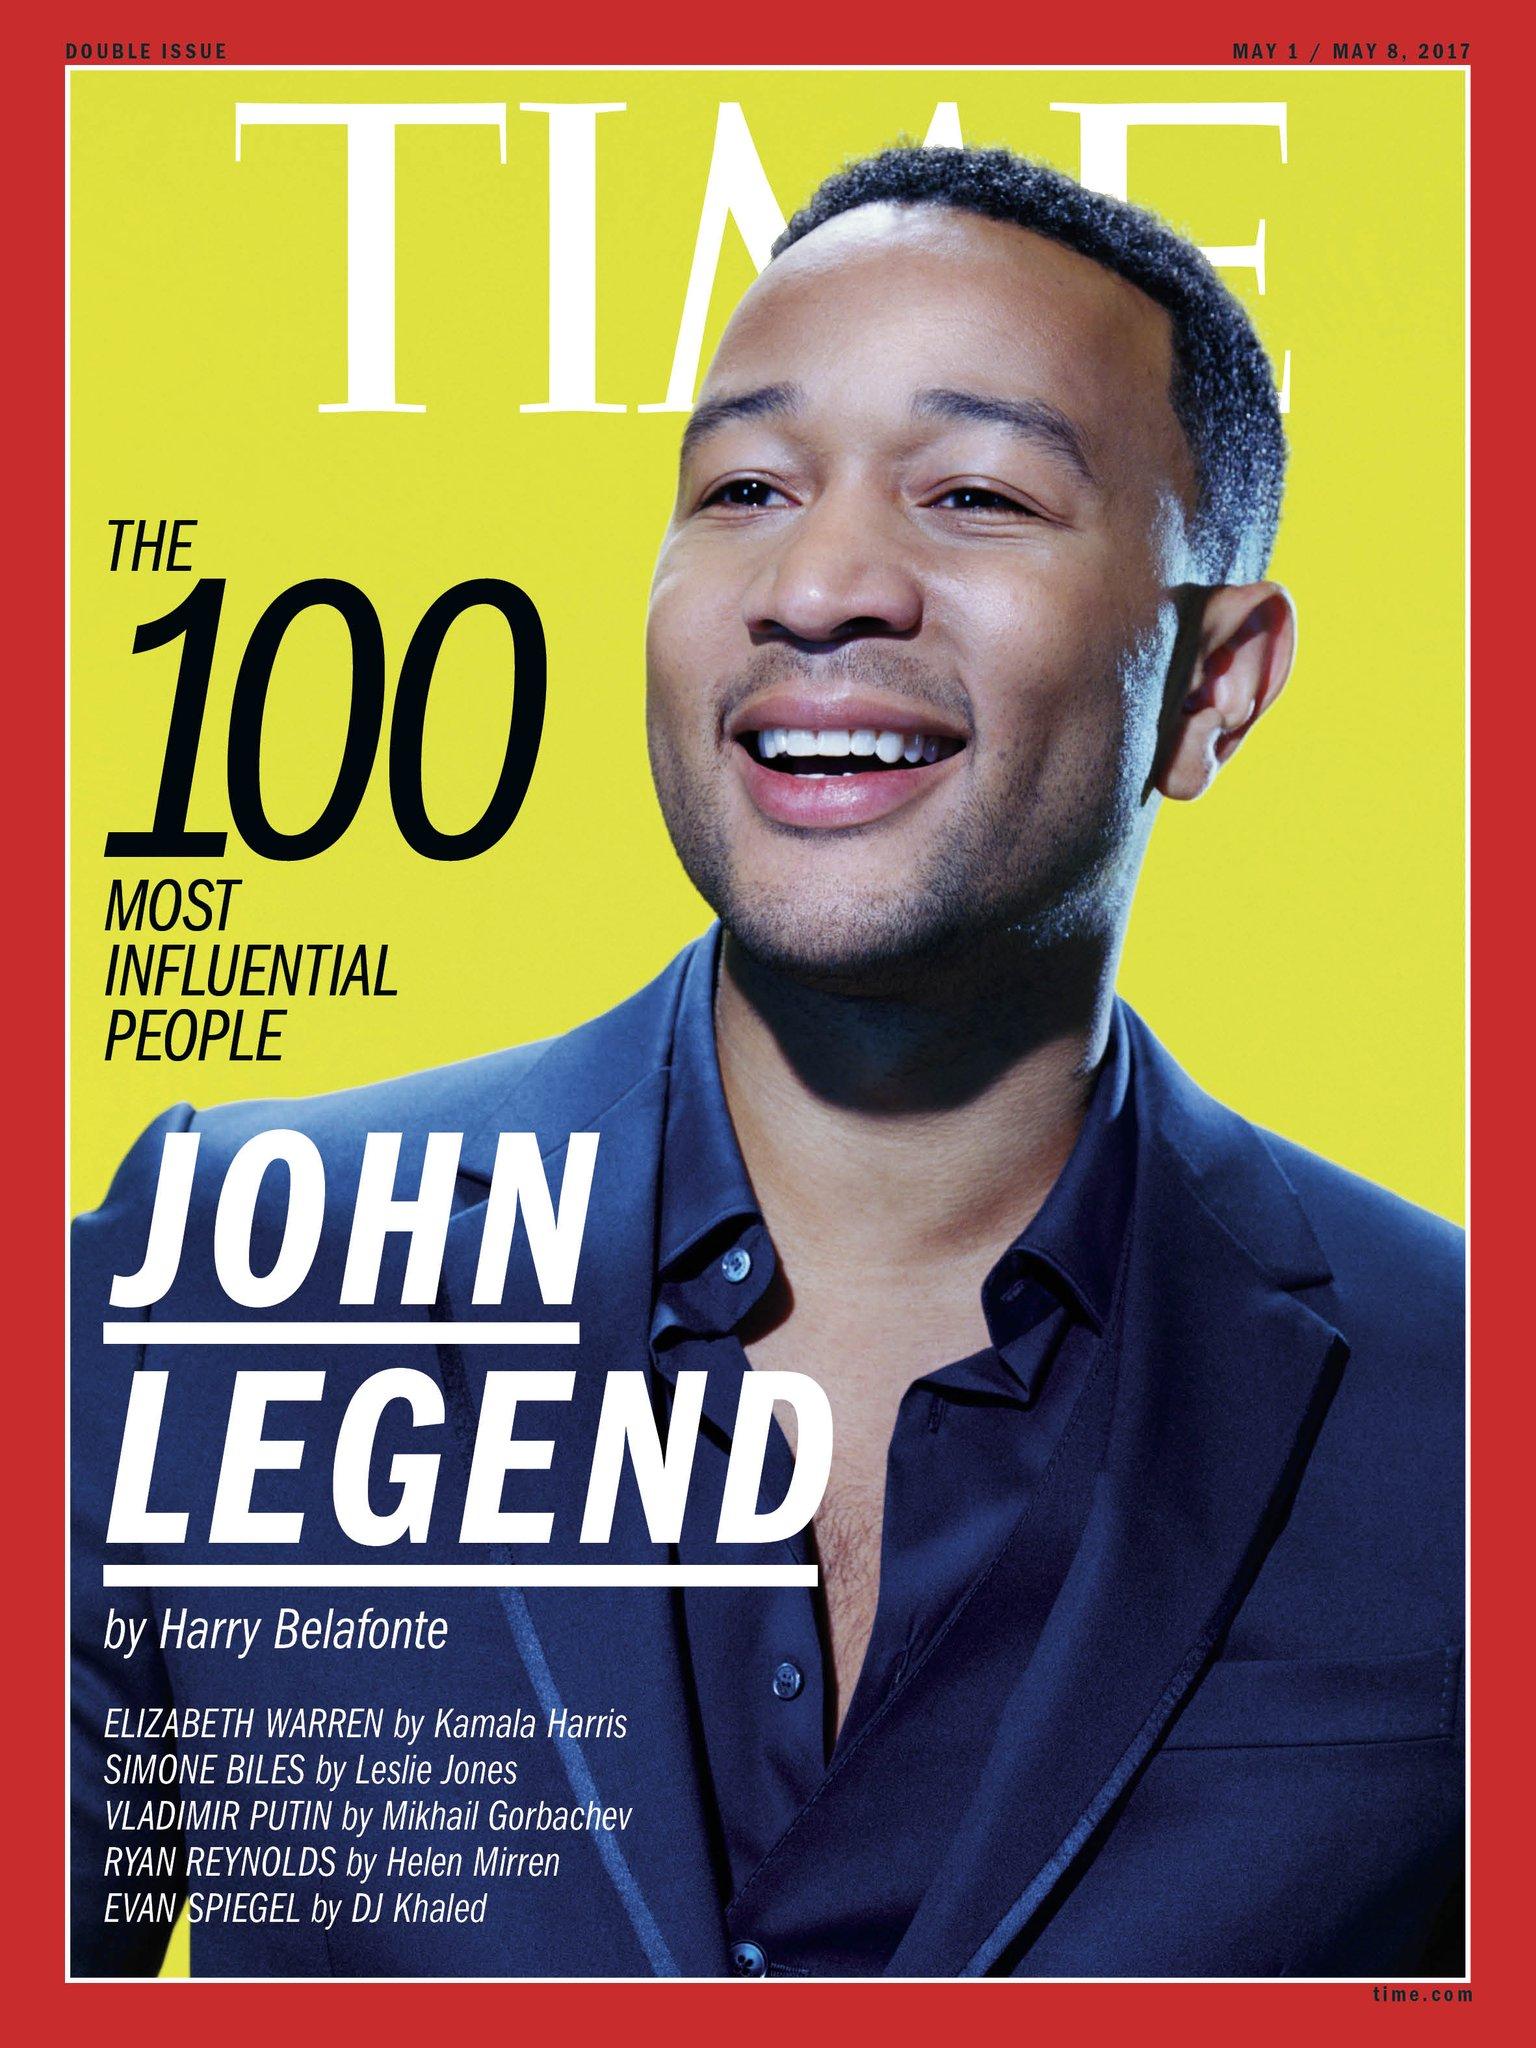 """.@JohnLegend uses his platform to push for meaningful social change,"" writes @HarryBelafonte #TIME100 https://t.co/60uj29KBC3 https://t.co/mC5mlrEr9R"